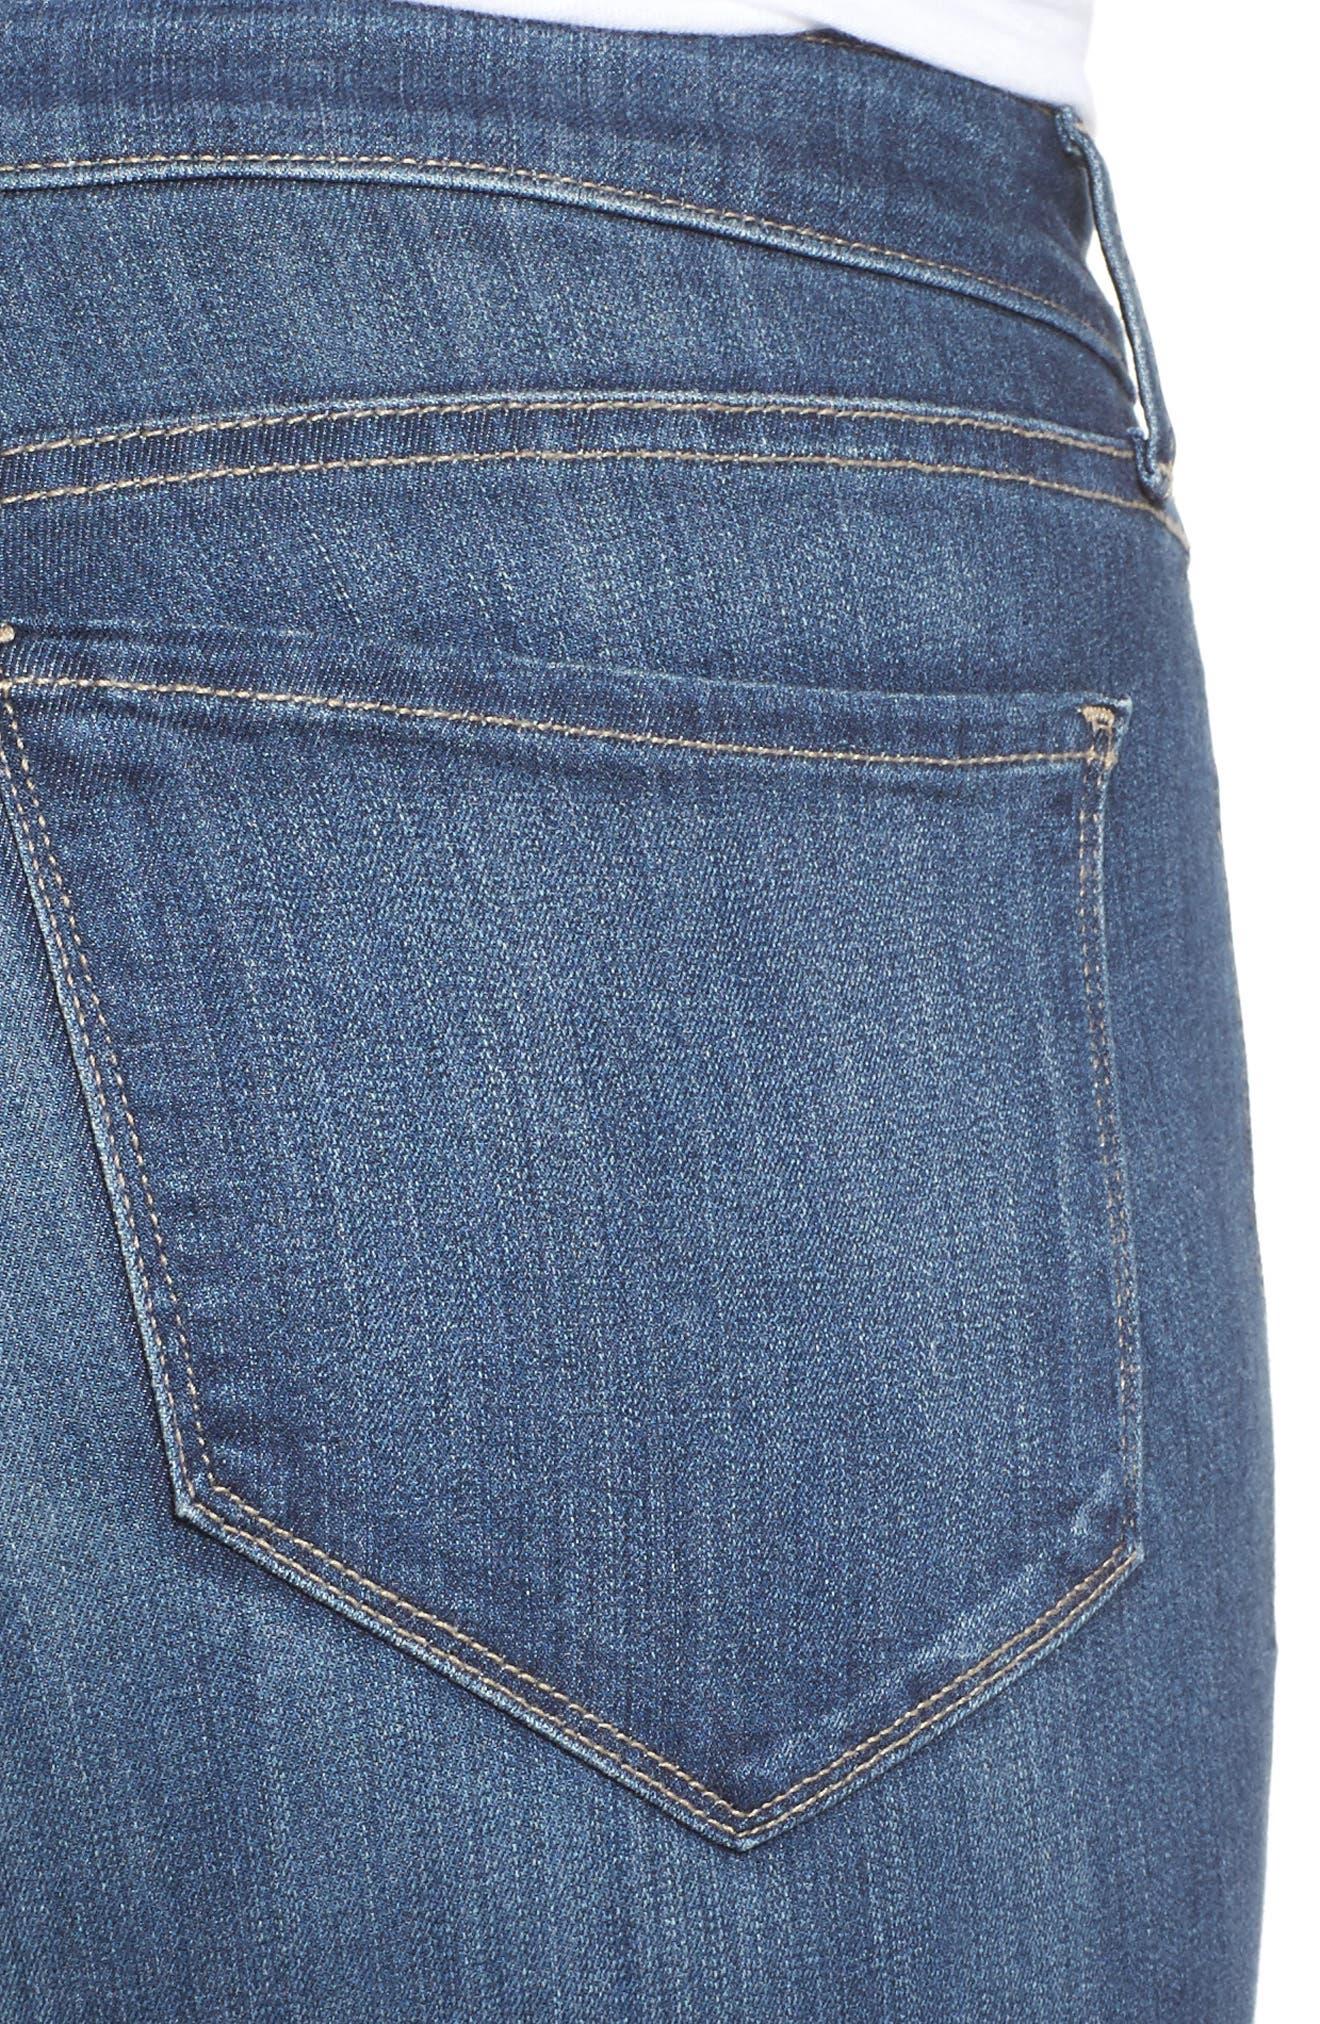 Ami Release Hem Stretch Skinny Jeans,                             Alternate thumbnail 4, color,                             428